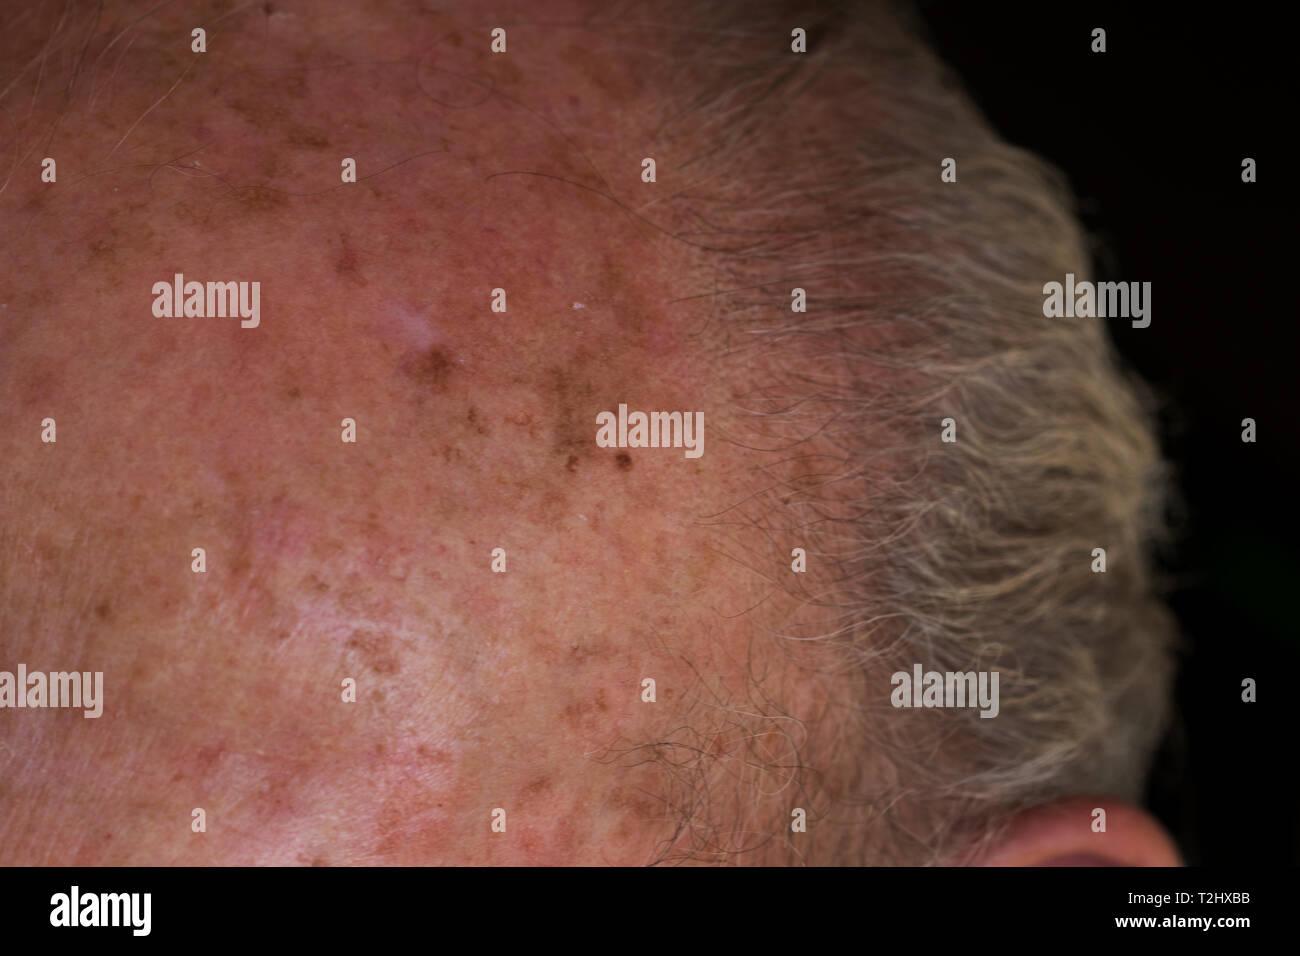 Carcinoma melanoma skin damage on elderly mans forehead from sun exposure. Close up of precancerous skin. Stock Photo